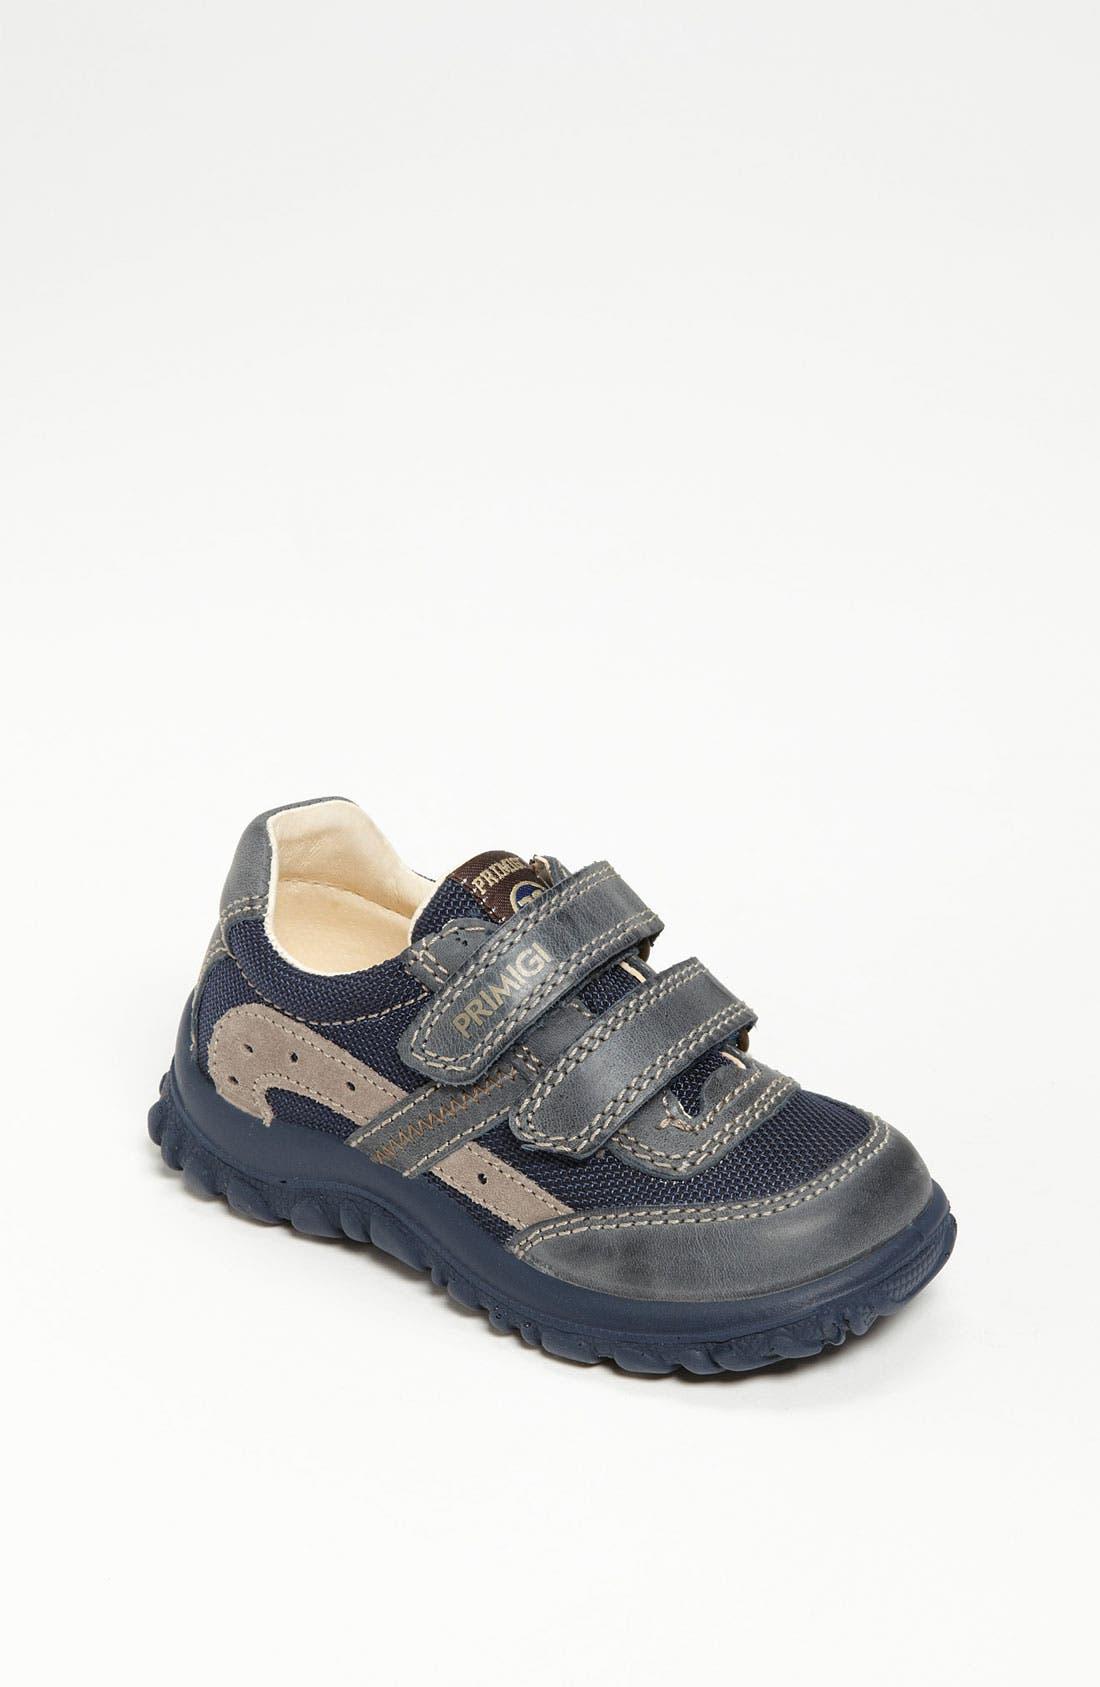 Main Image - Primigi 'Charan' Sneaker (Walker, Toddler & Little Kid)